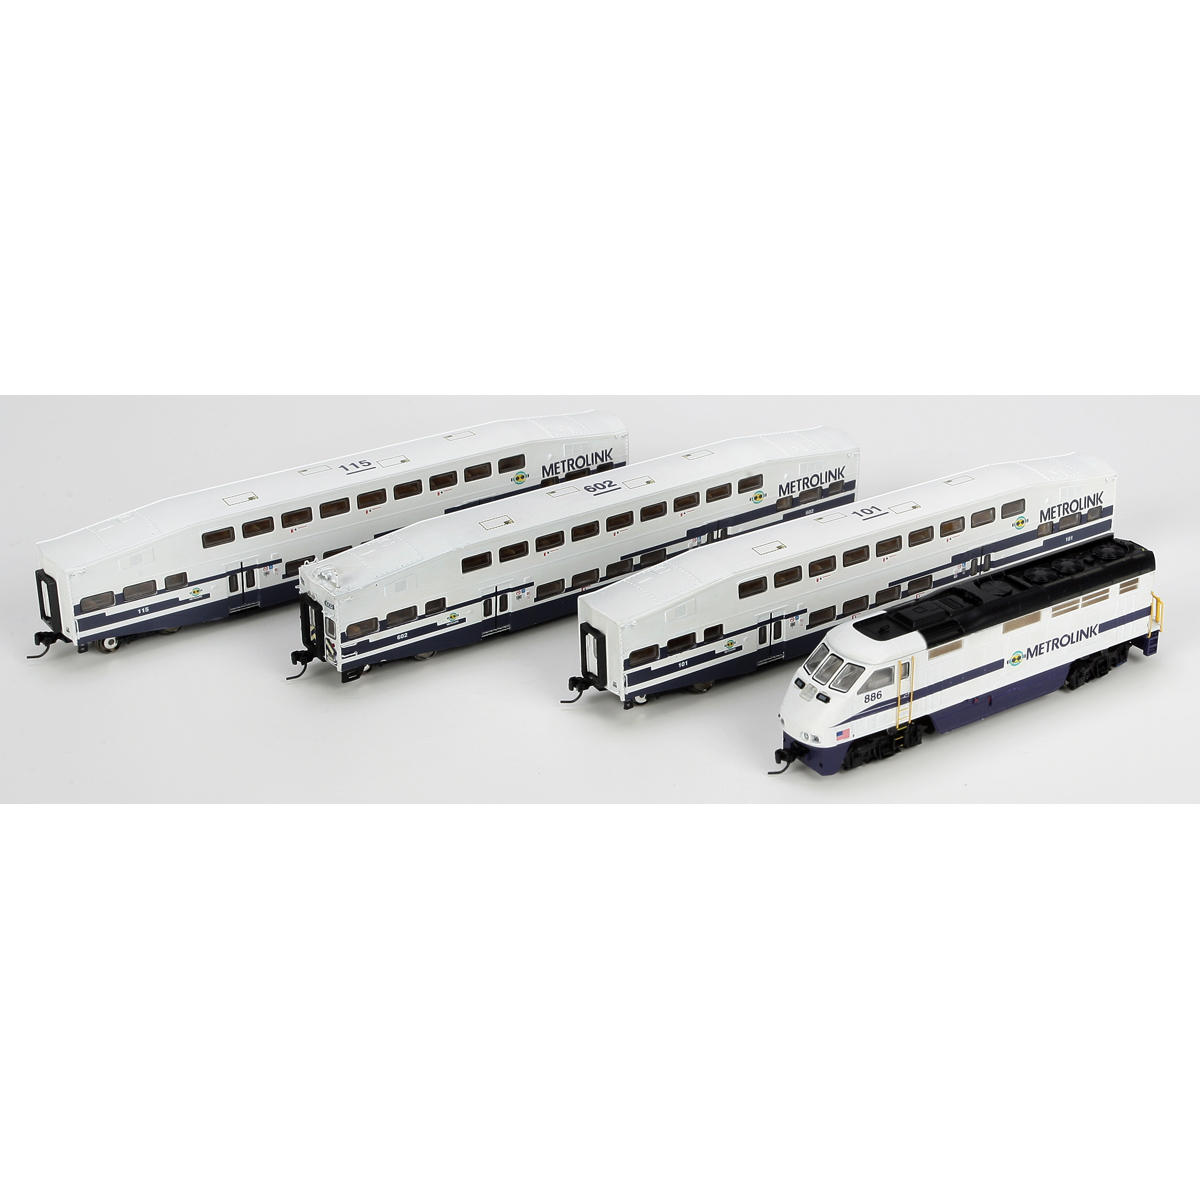 N Scale - Athearn - 25982 - Passenger Car, Commuter, Bombardier Multi-Level - Metrolink - 4 numbers